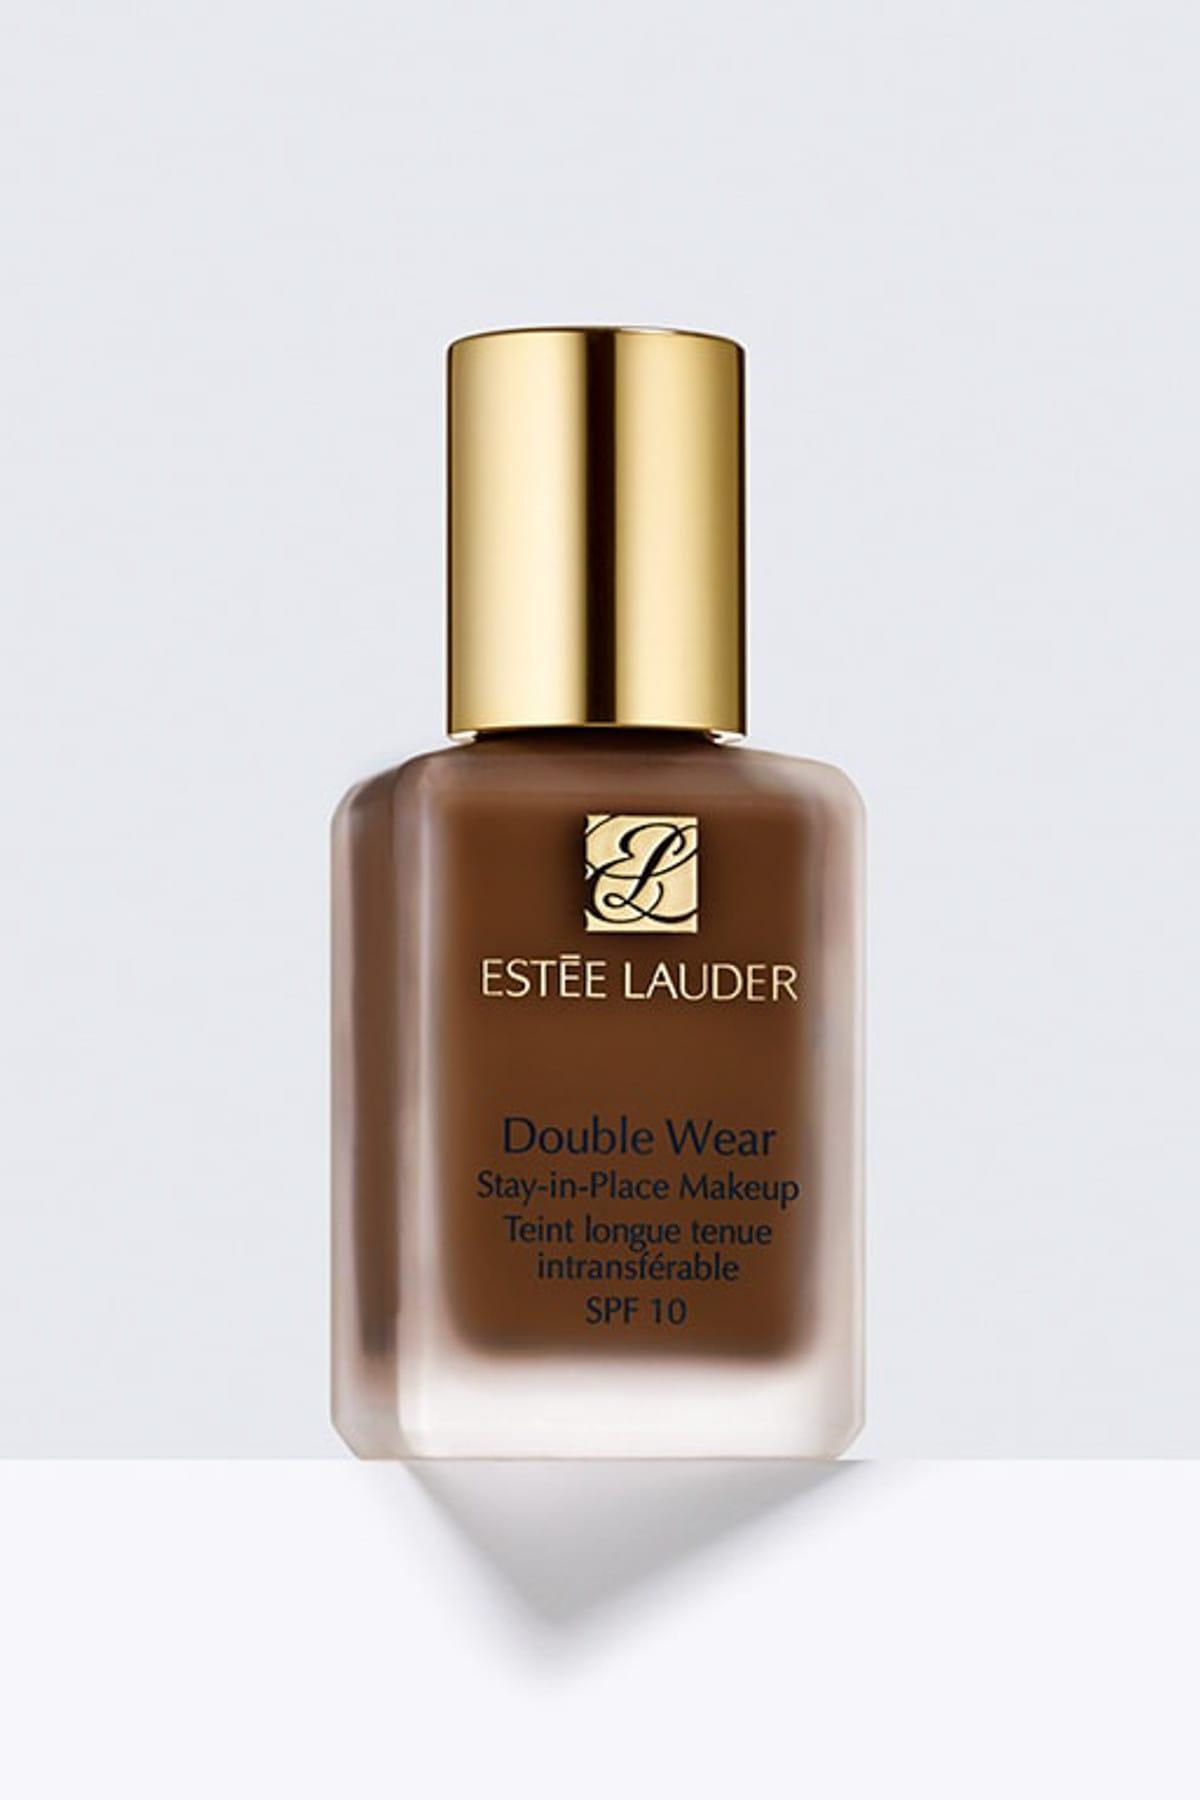 Estee Lauder Fondöten - Double Wear Foundation S.I.P Spf 10 8N1 Espresso 30 ml 887167178069 1